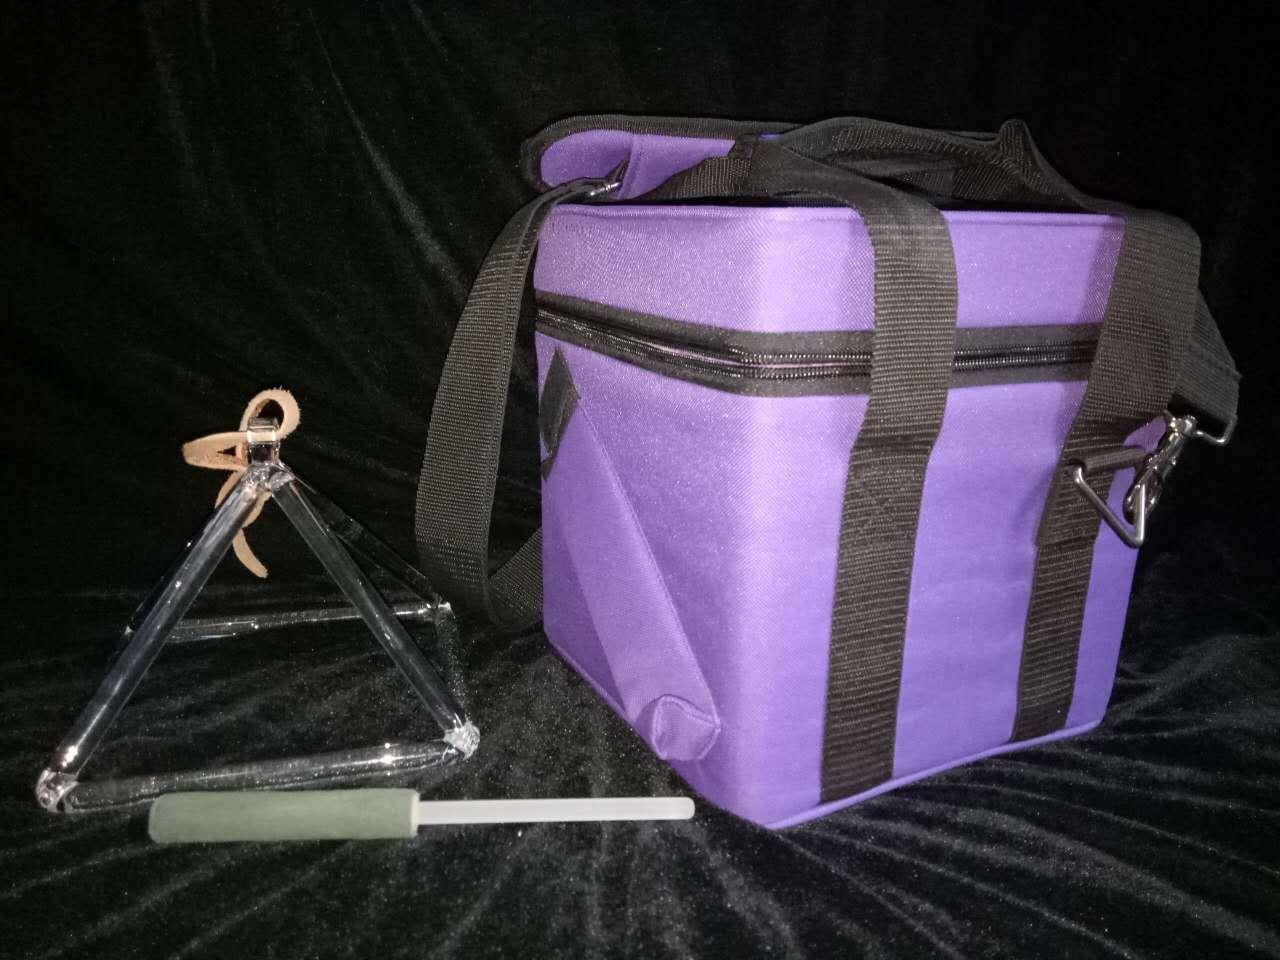 9 Zoll Crystal Quartz Singing Pyramid & 9 Zoll lila Carrying Case && Striker